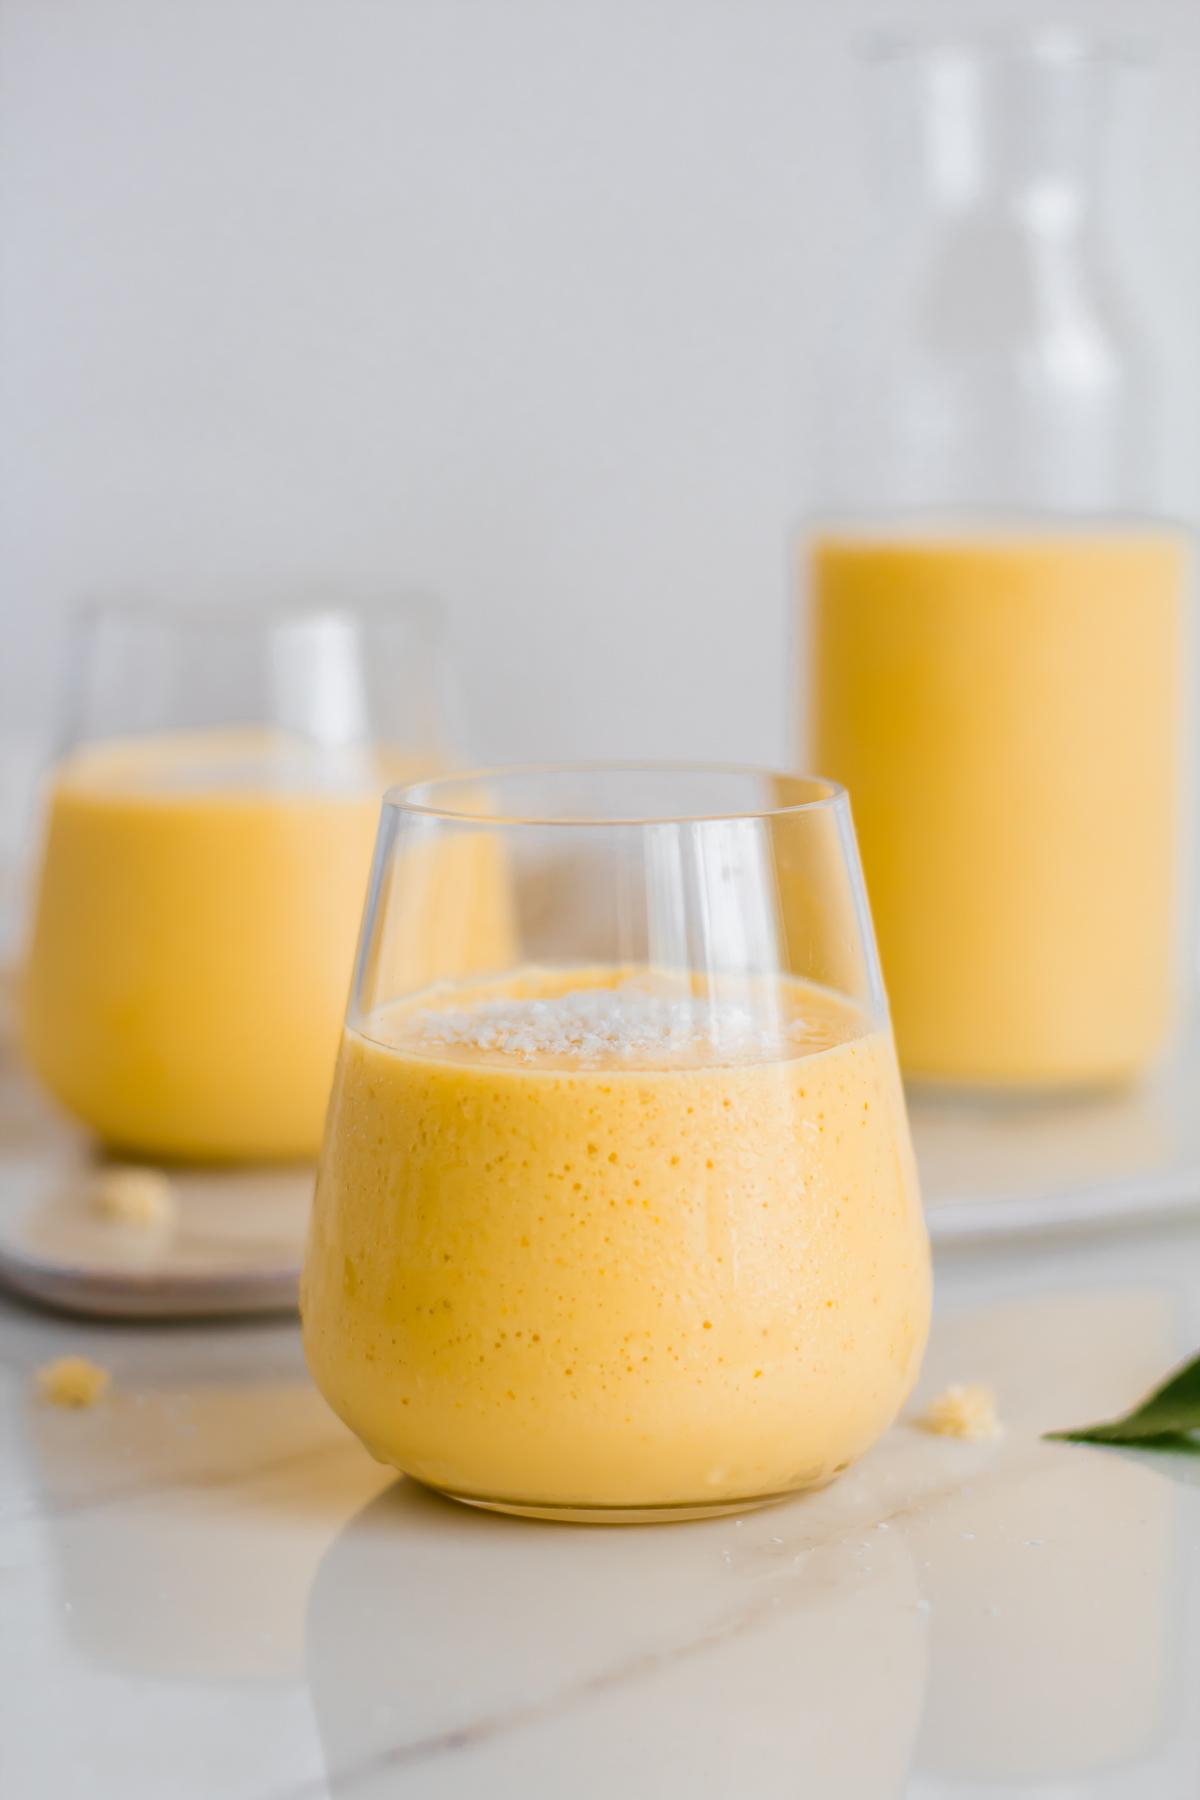 mango lassi without yogurt in glass